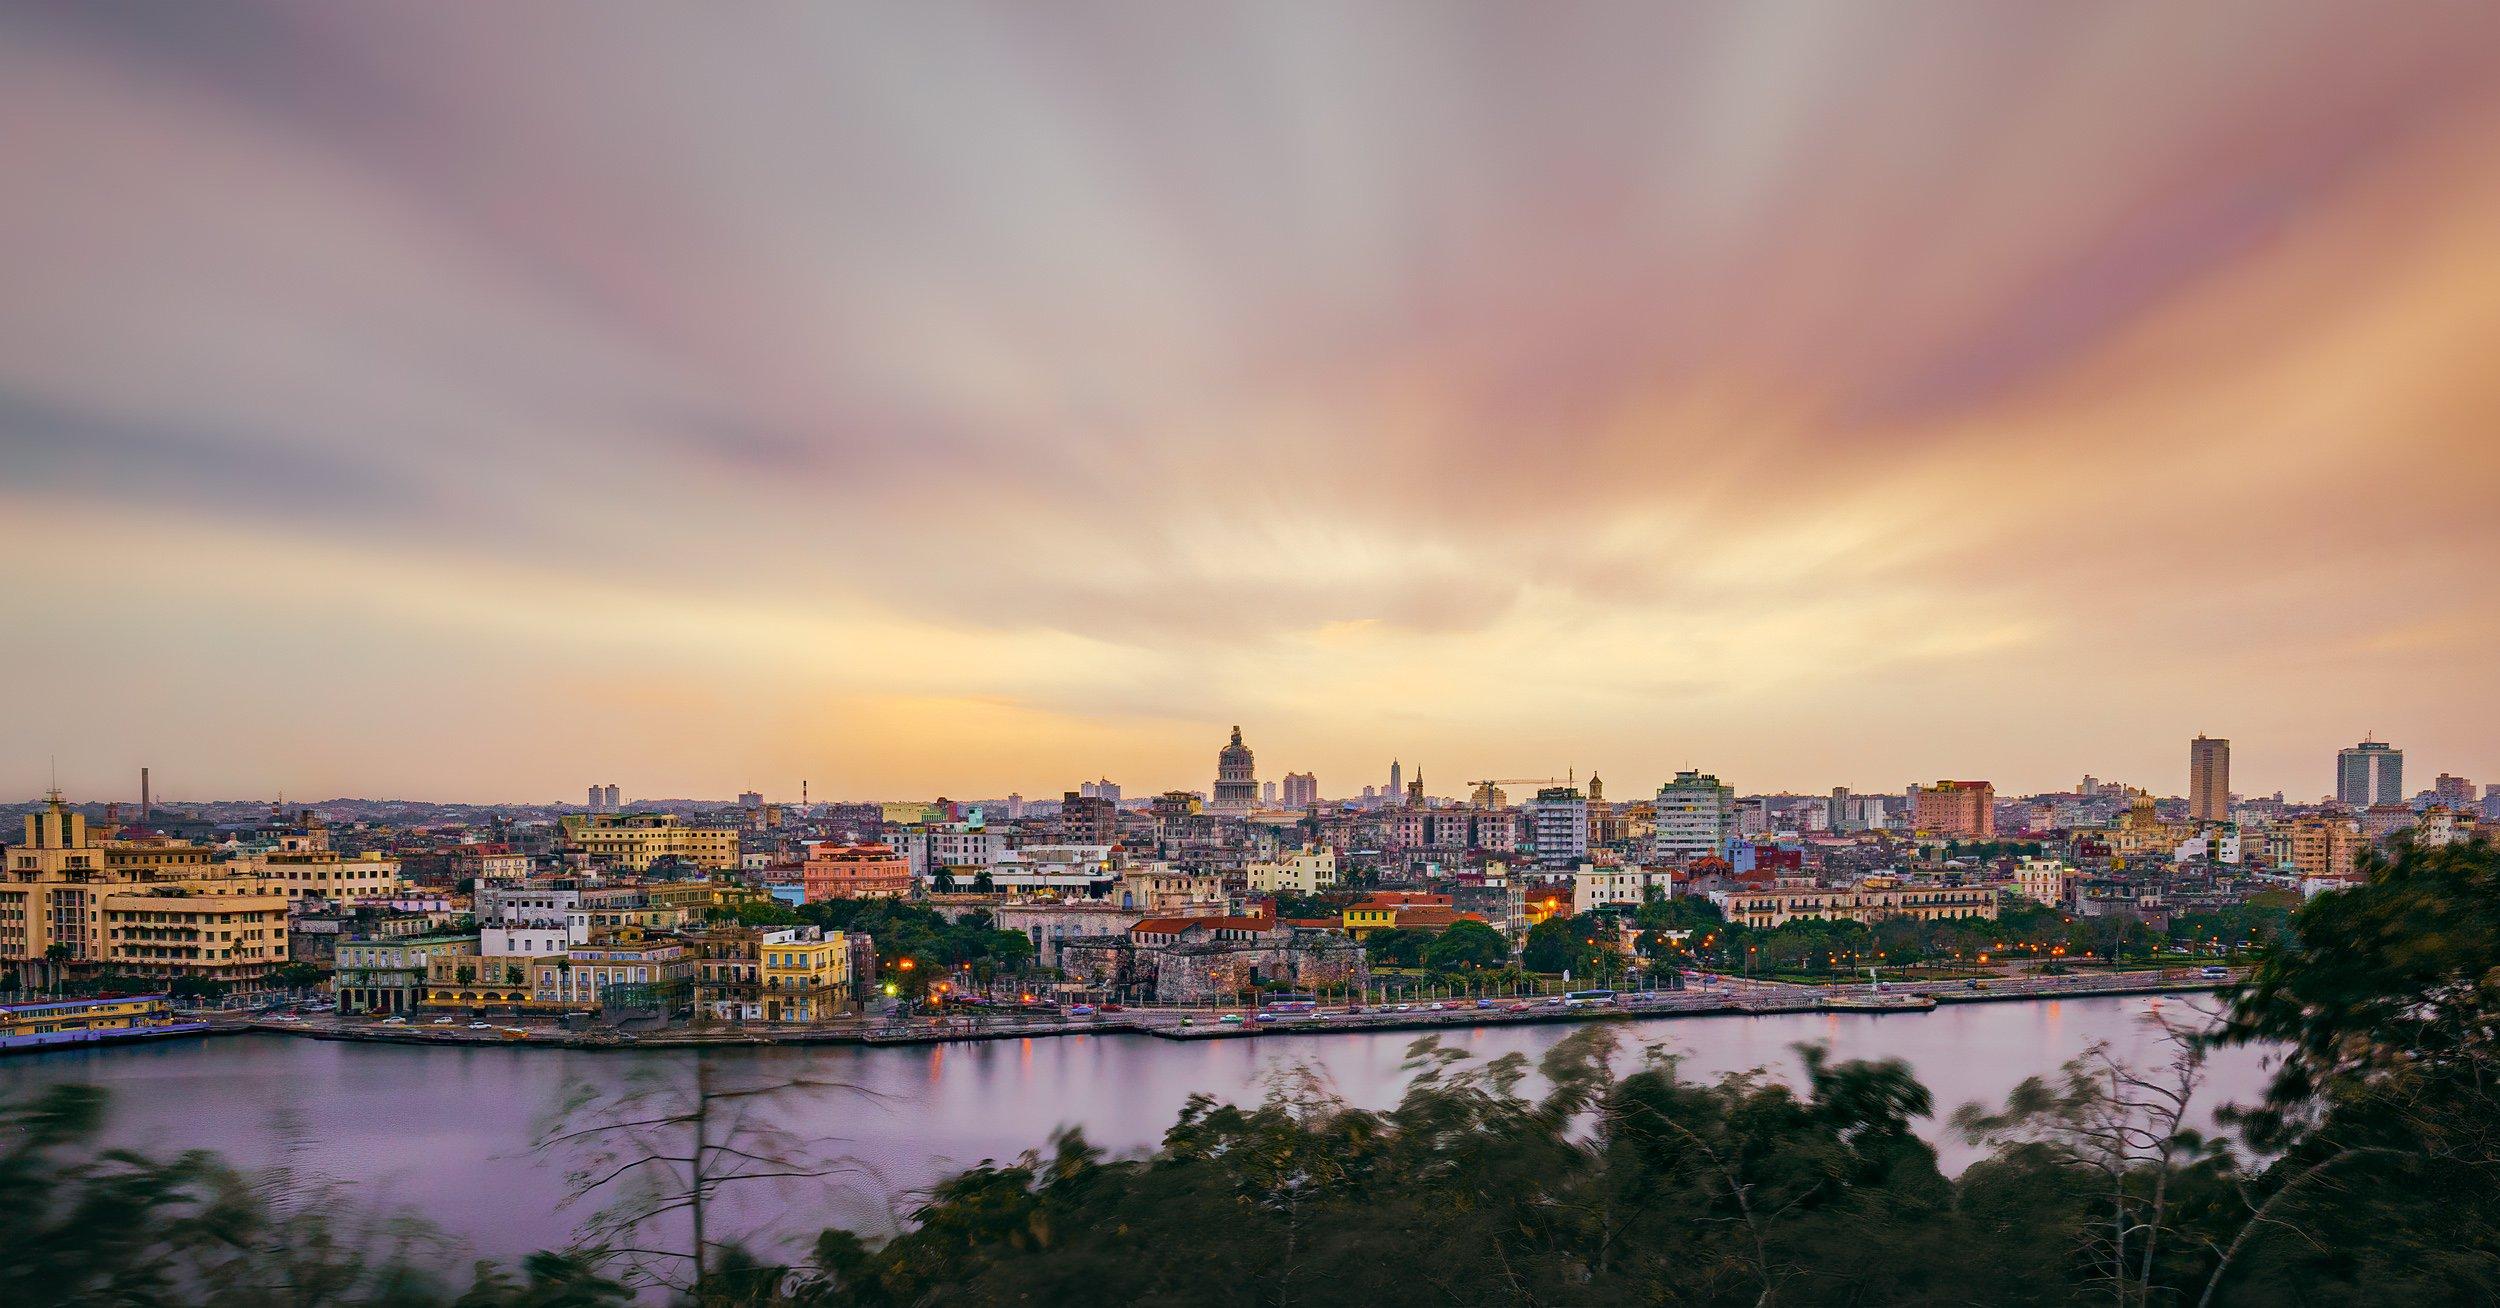 sunset over the skyline of Havana Cuba #intentionallylost